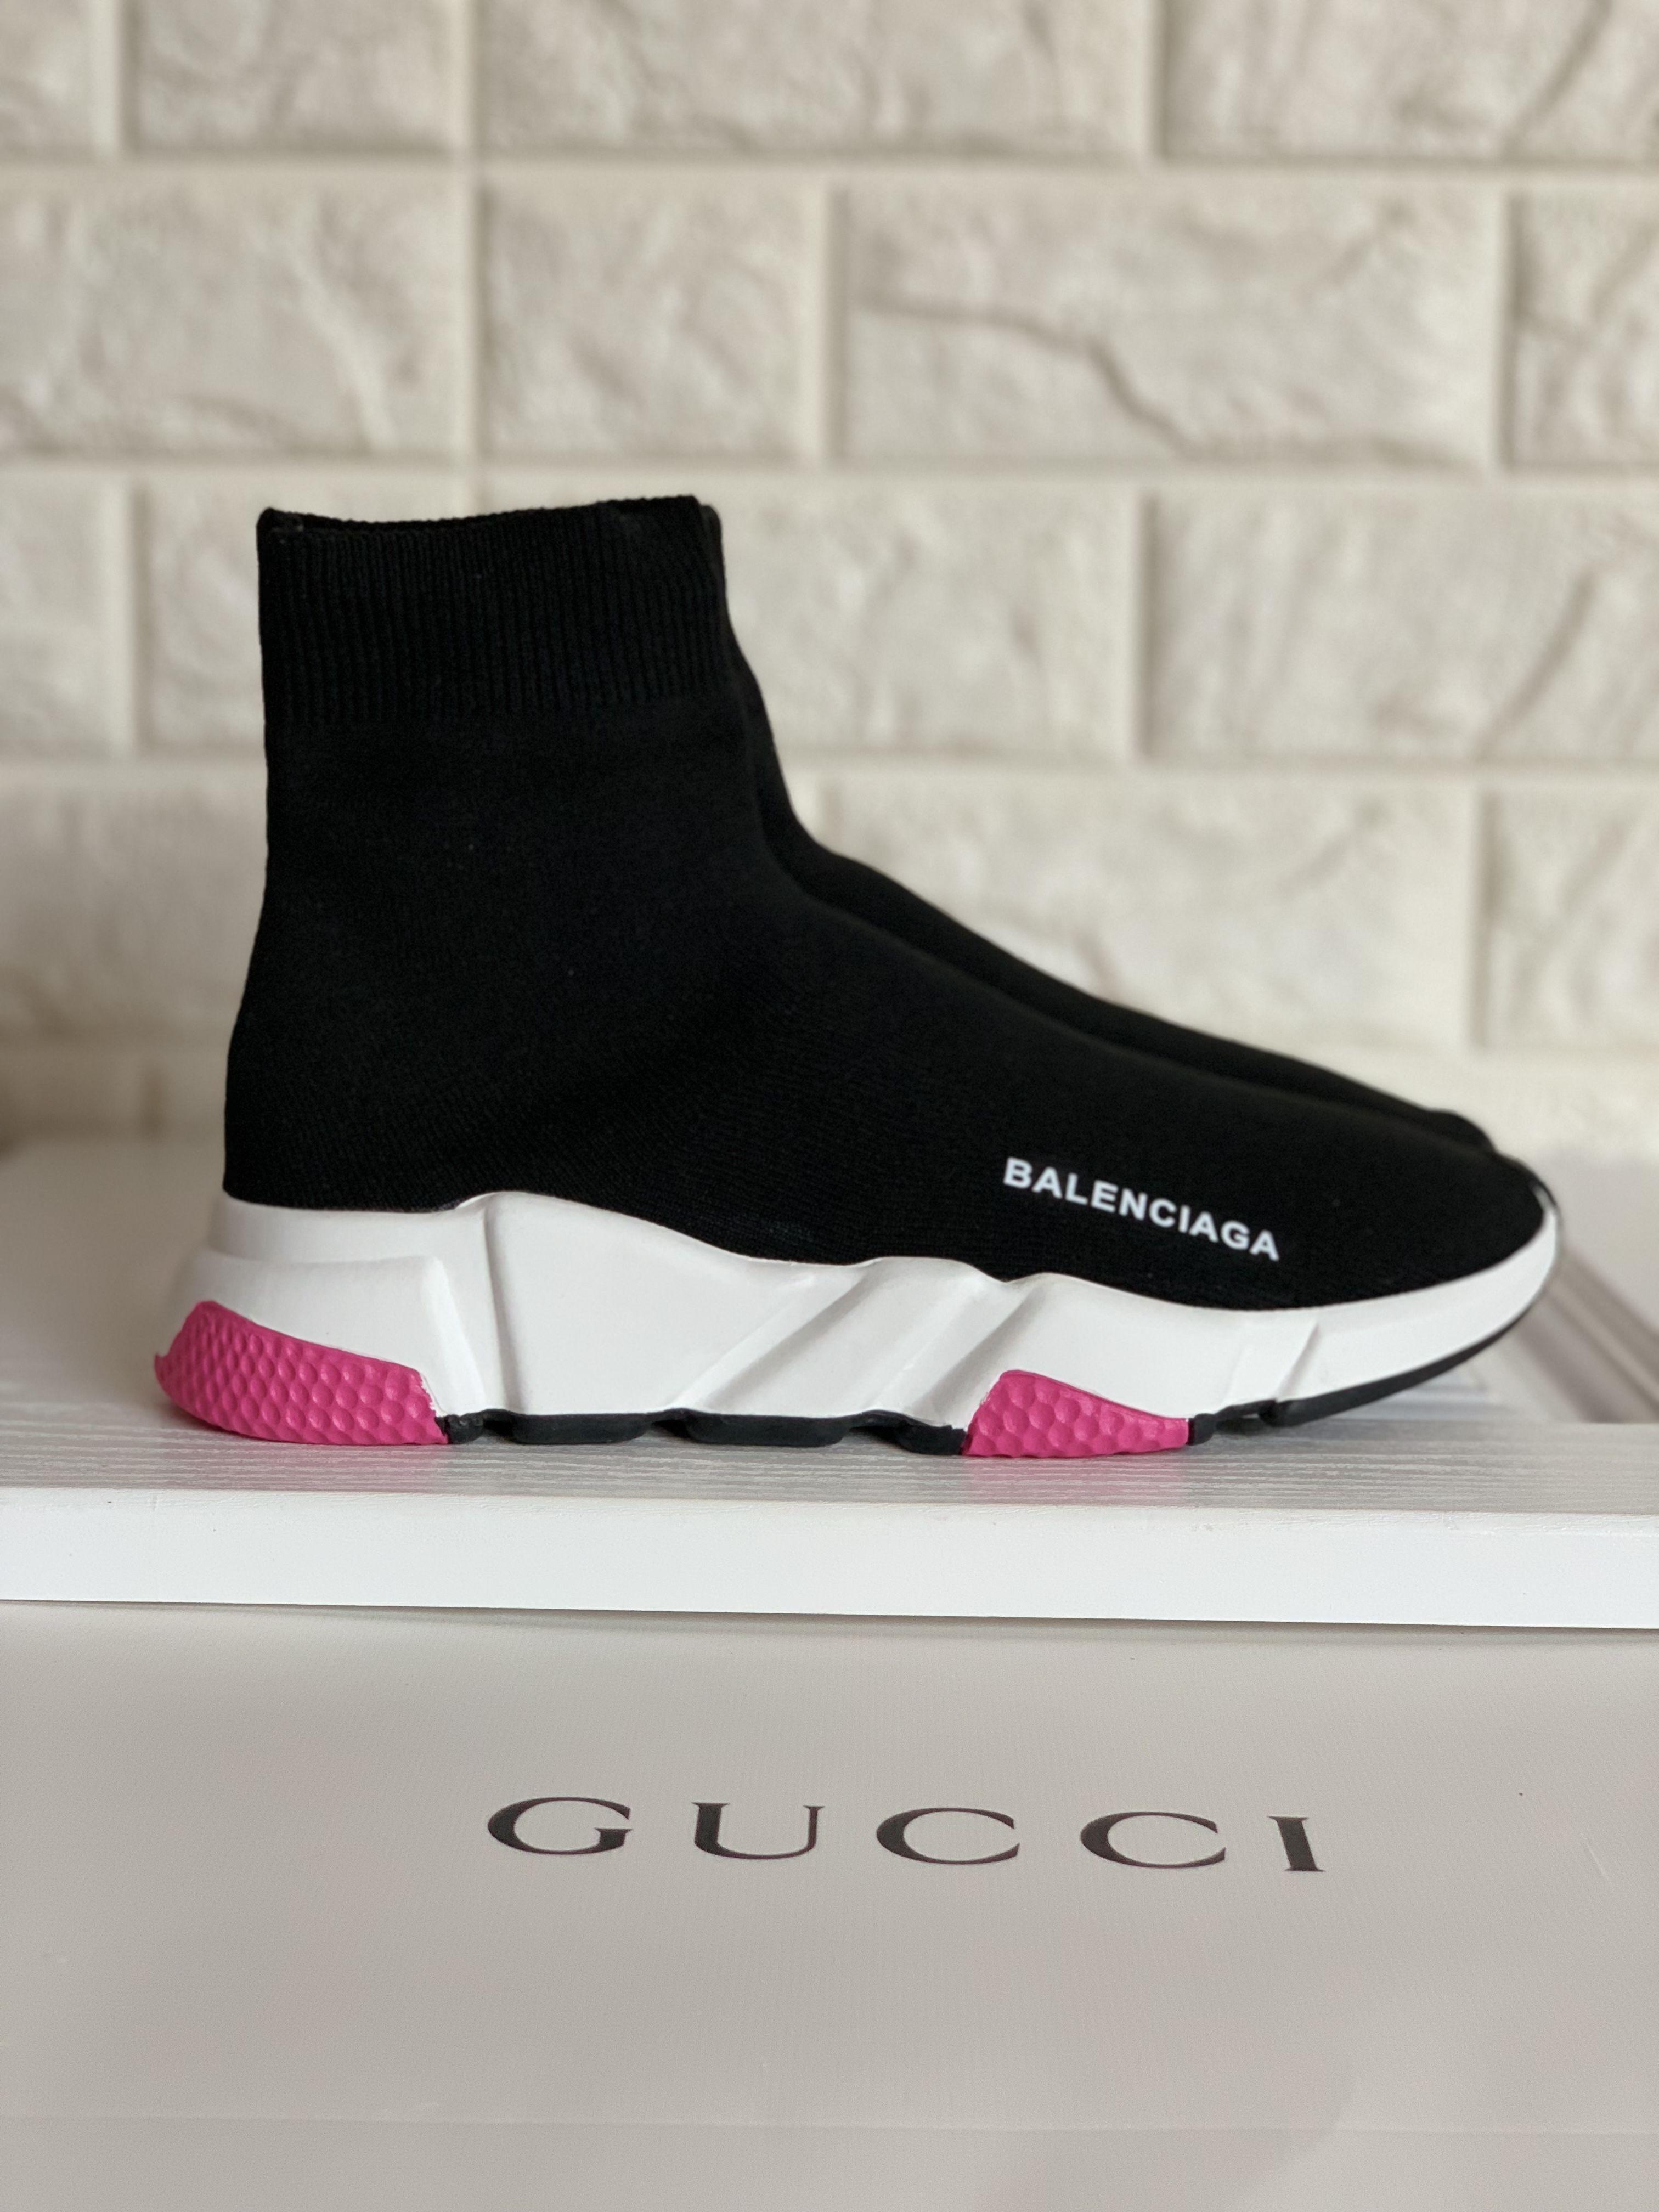 Balenciaga sock boots black with hot